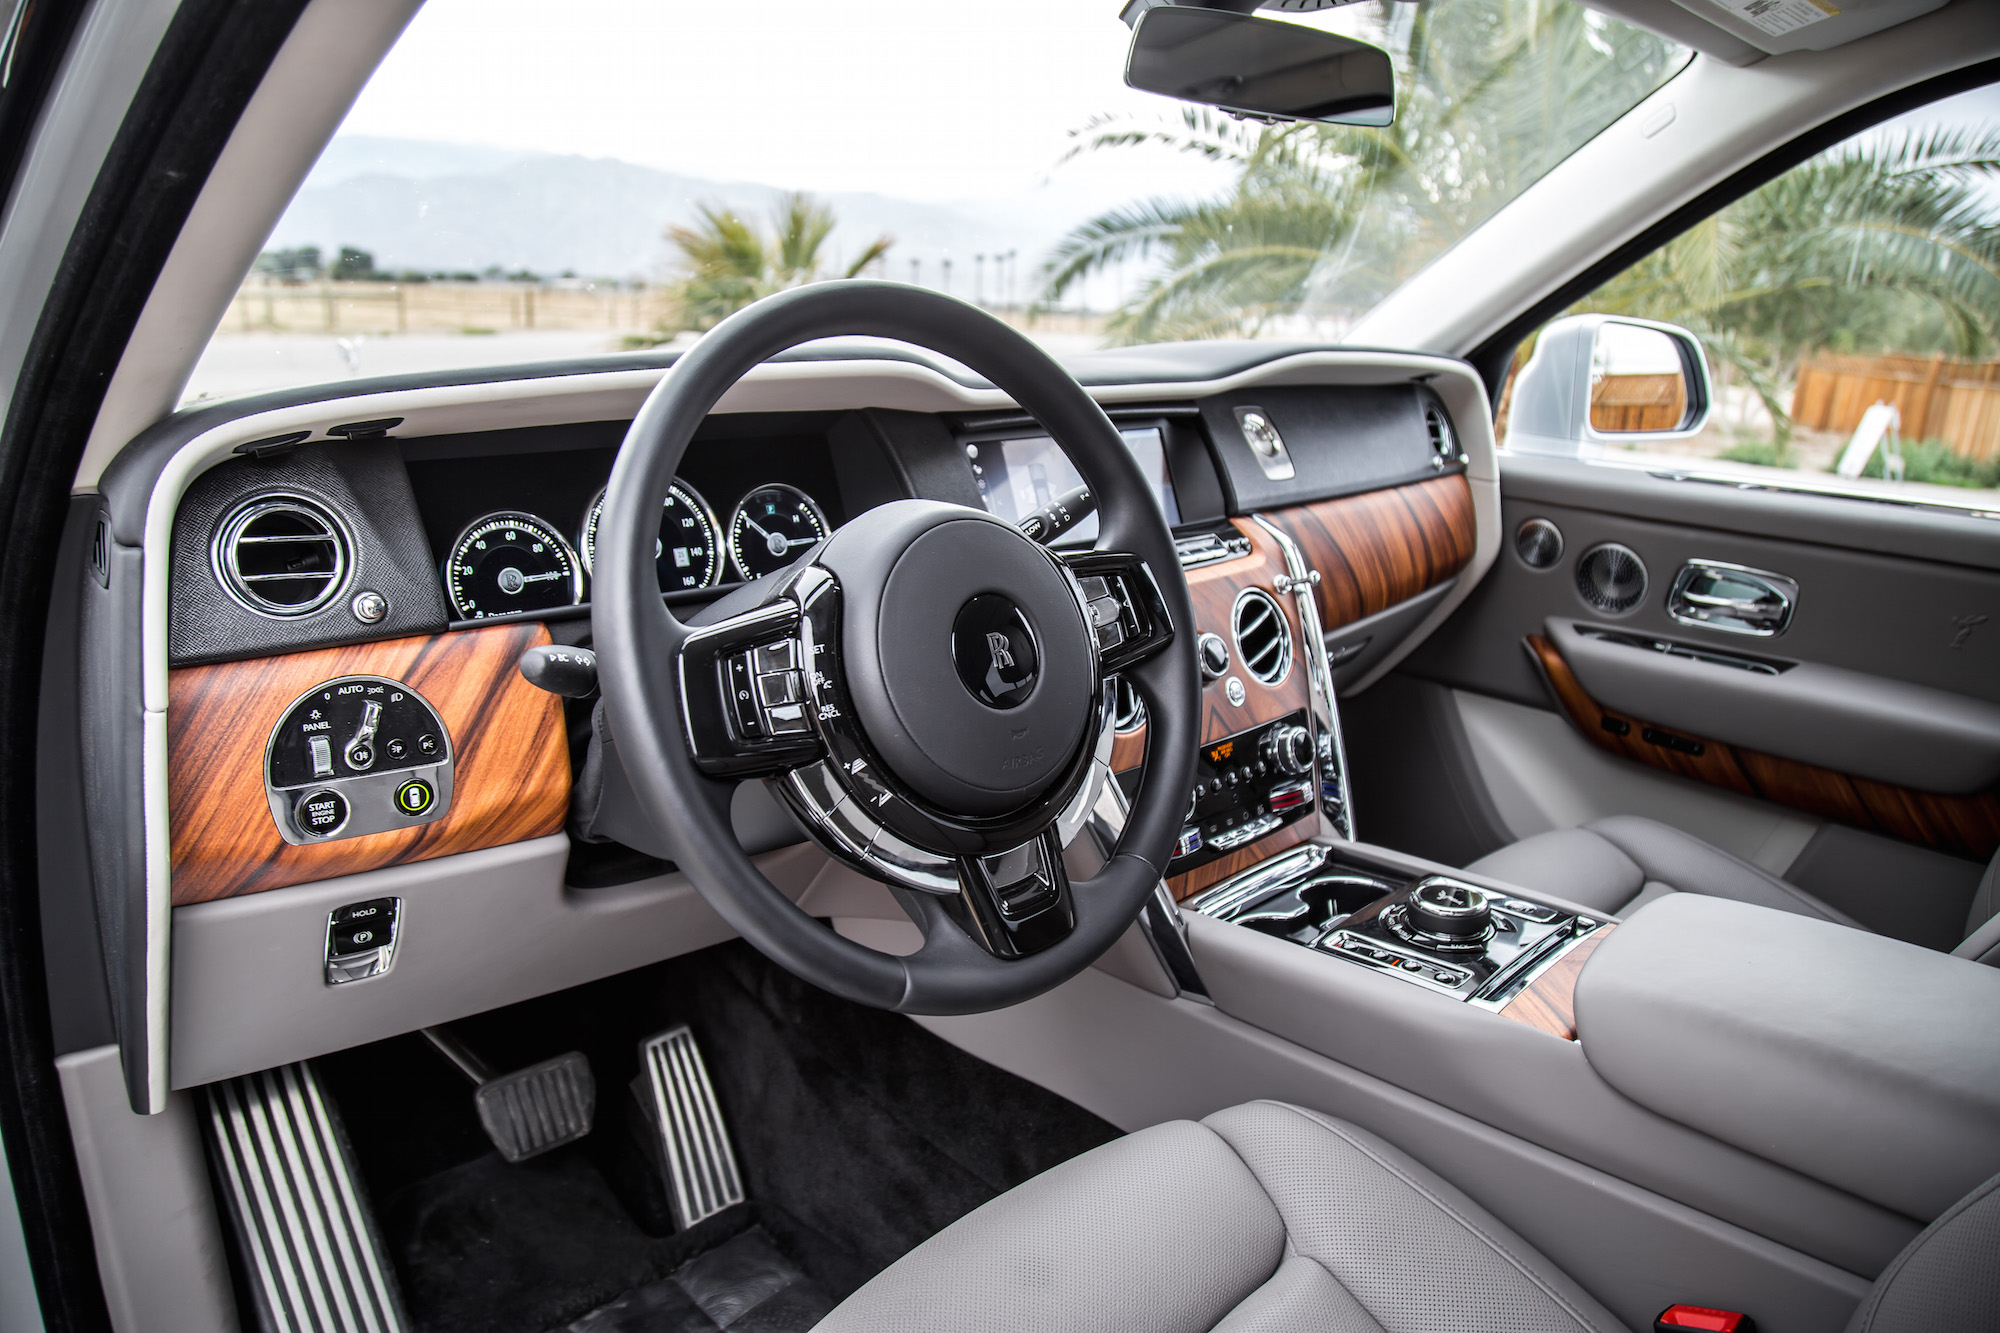 Review 2019 Rolls Royce Cullinan CAR